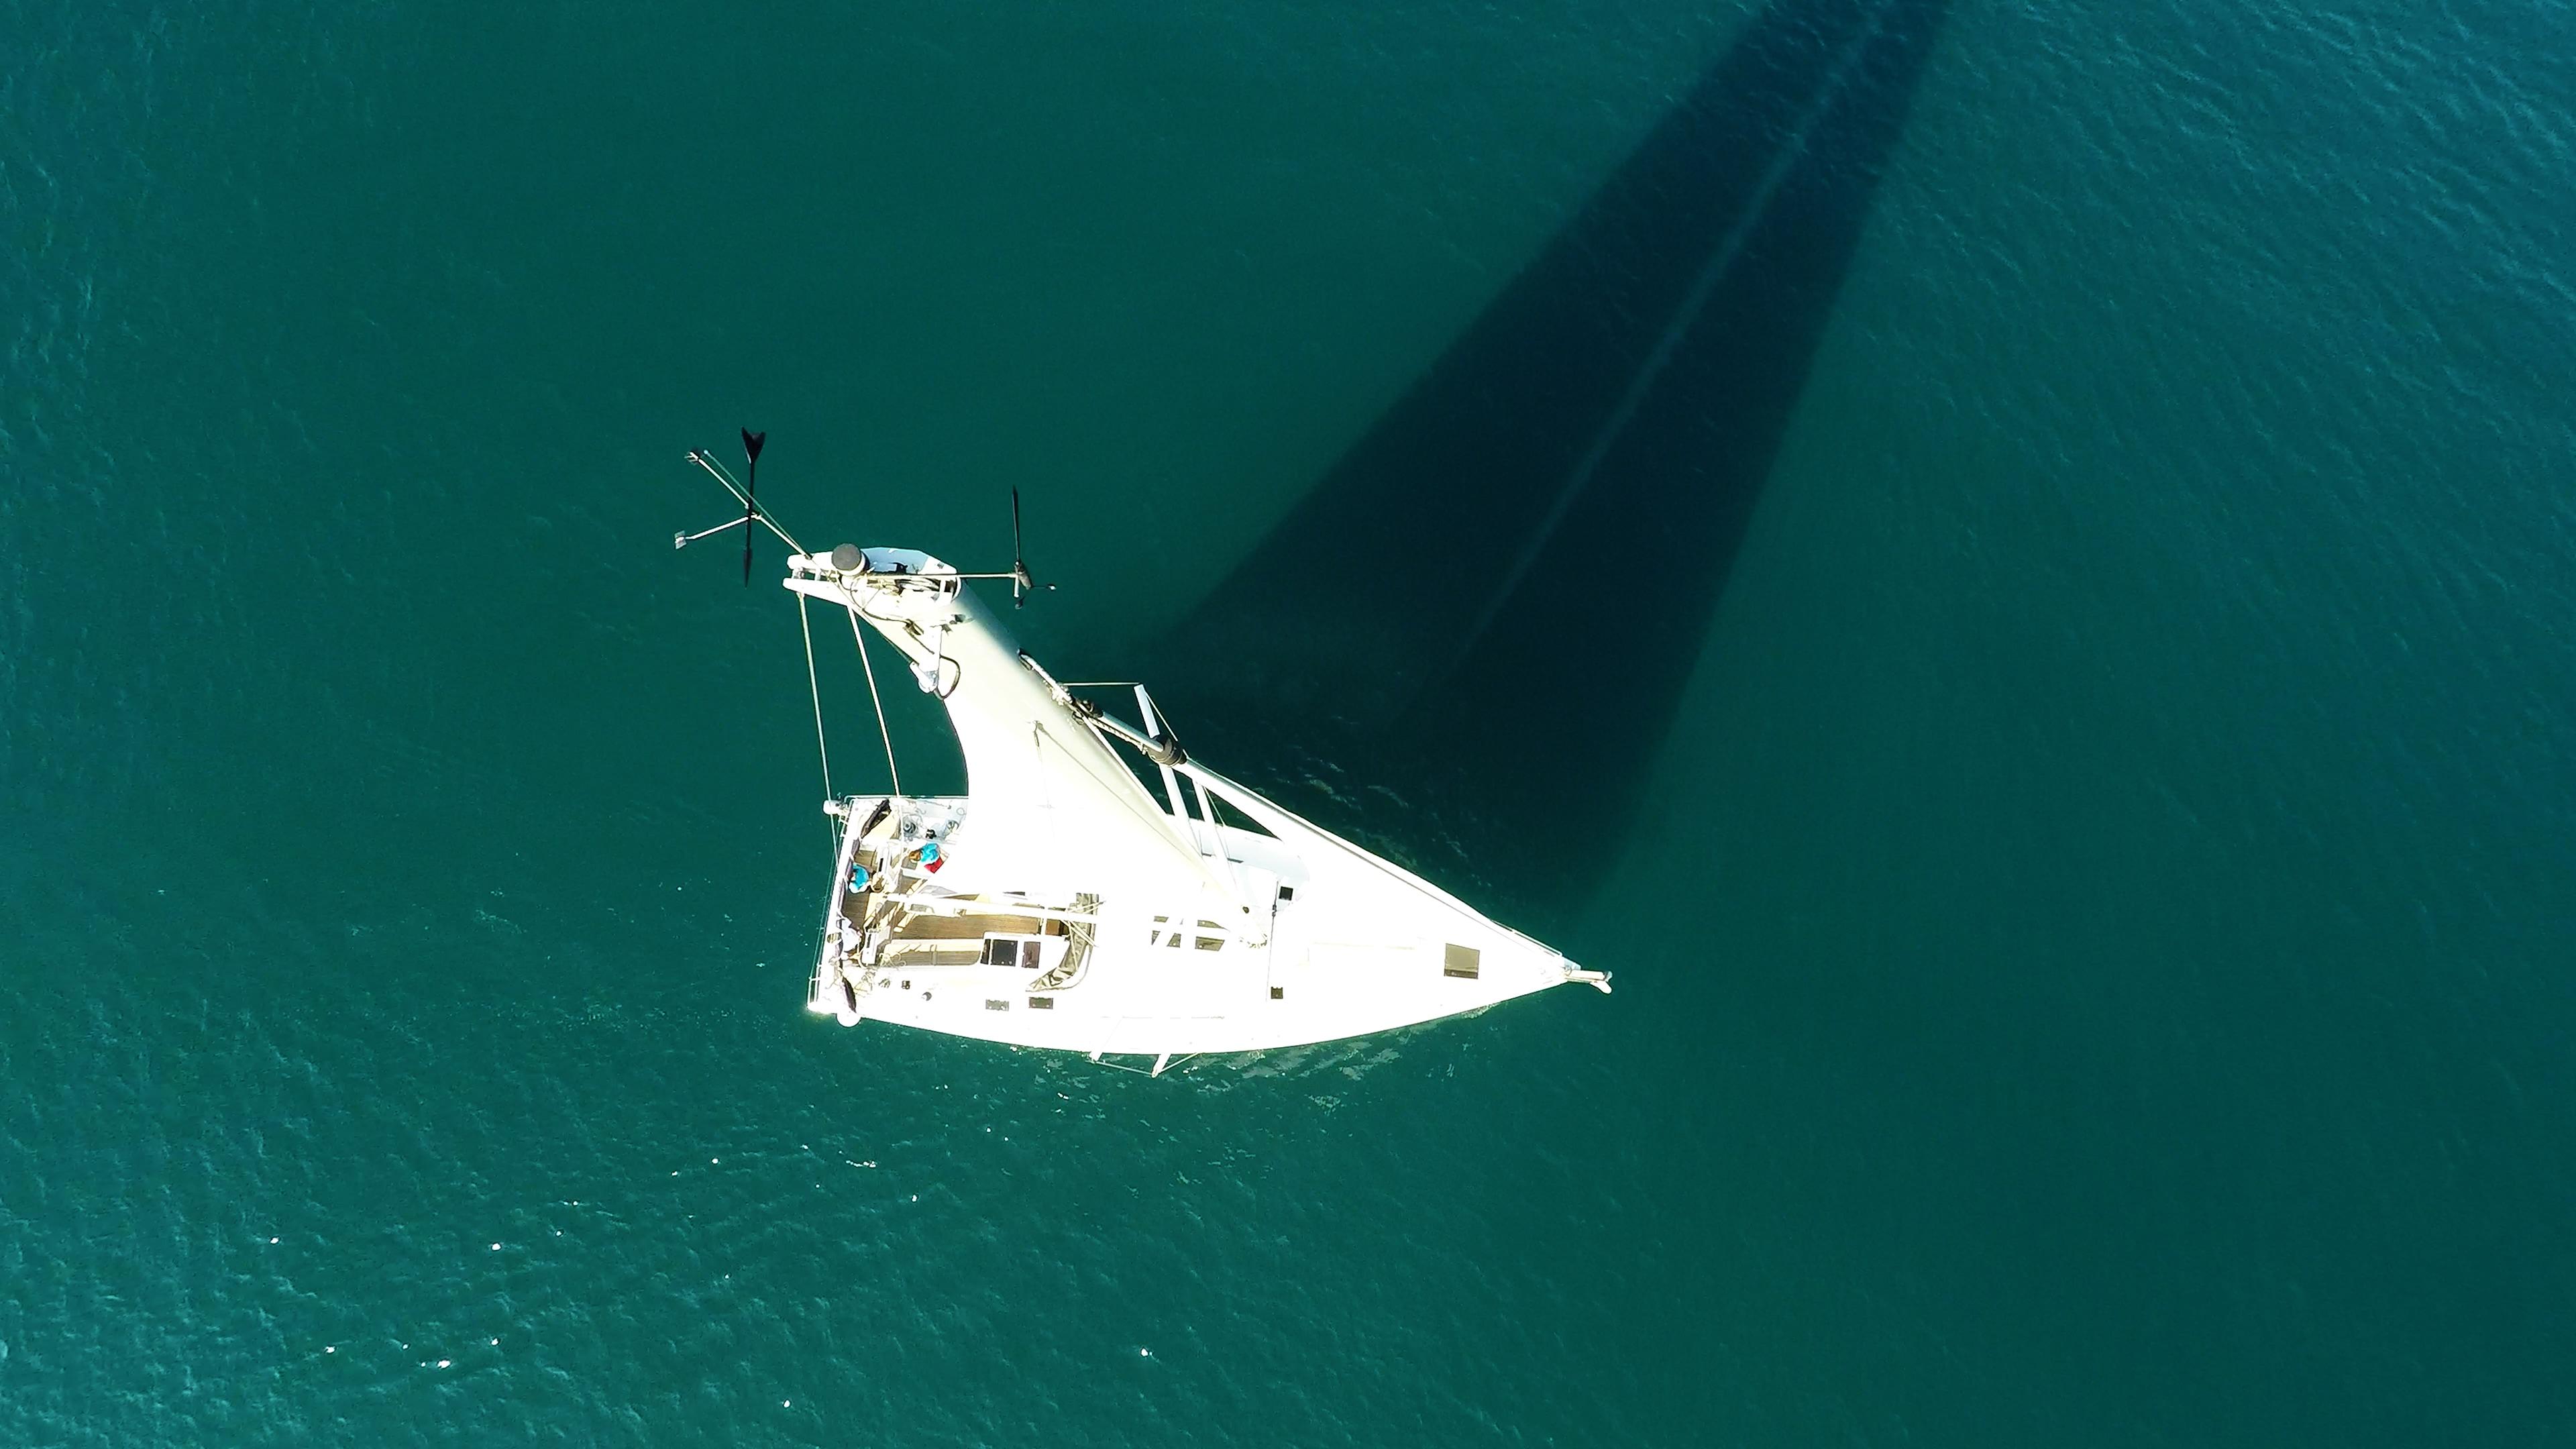 barcha a vela cima dell'albero vista verticalee nadir yacht a vela Hanse 505 ponte pozzetto mare barca a vela barca